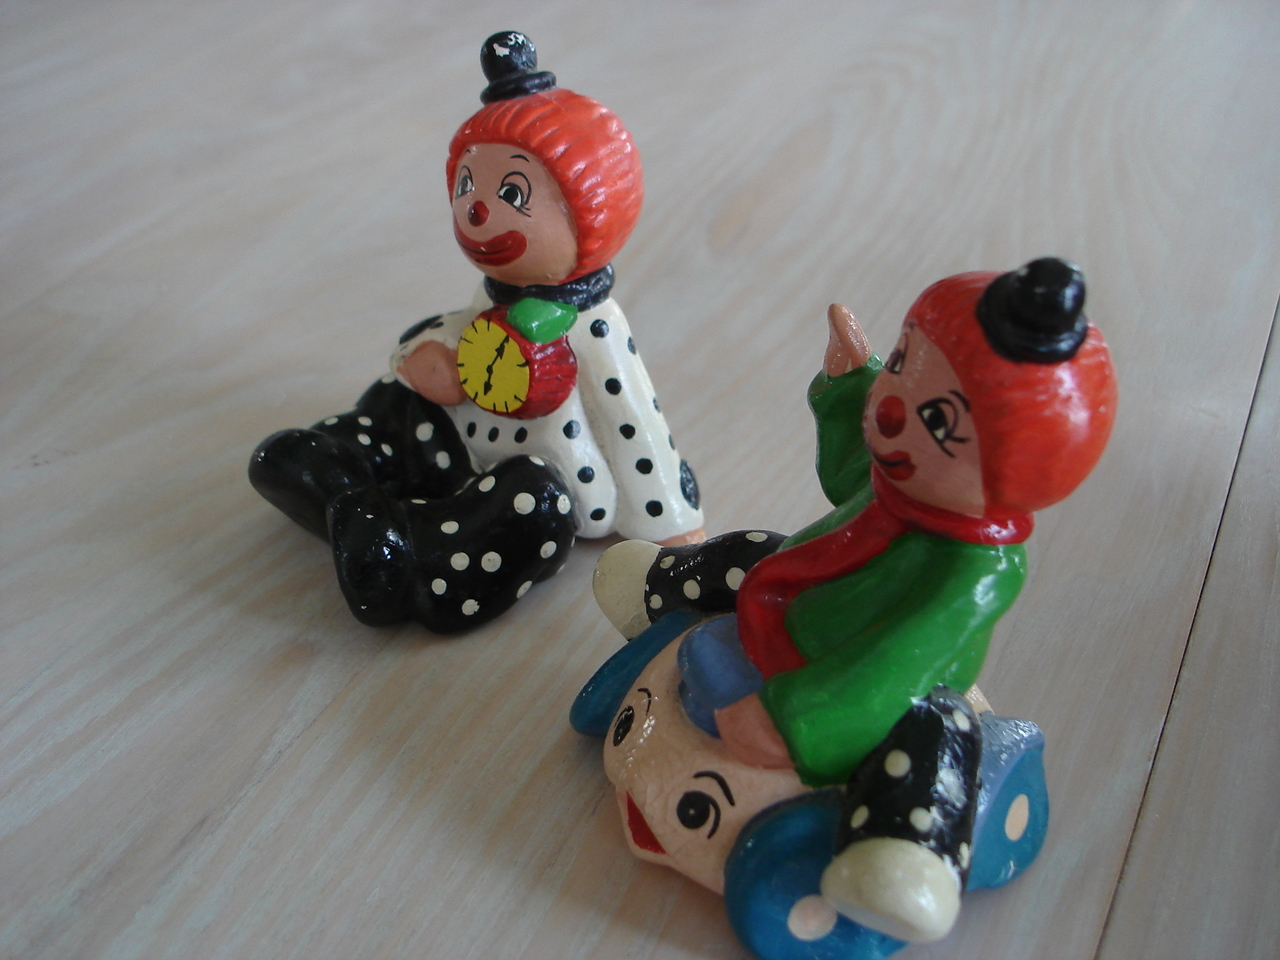 Vintage Enesco Circus Clown Figurines, Ceramic, Painted Colors